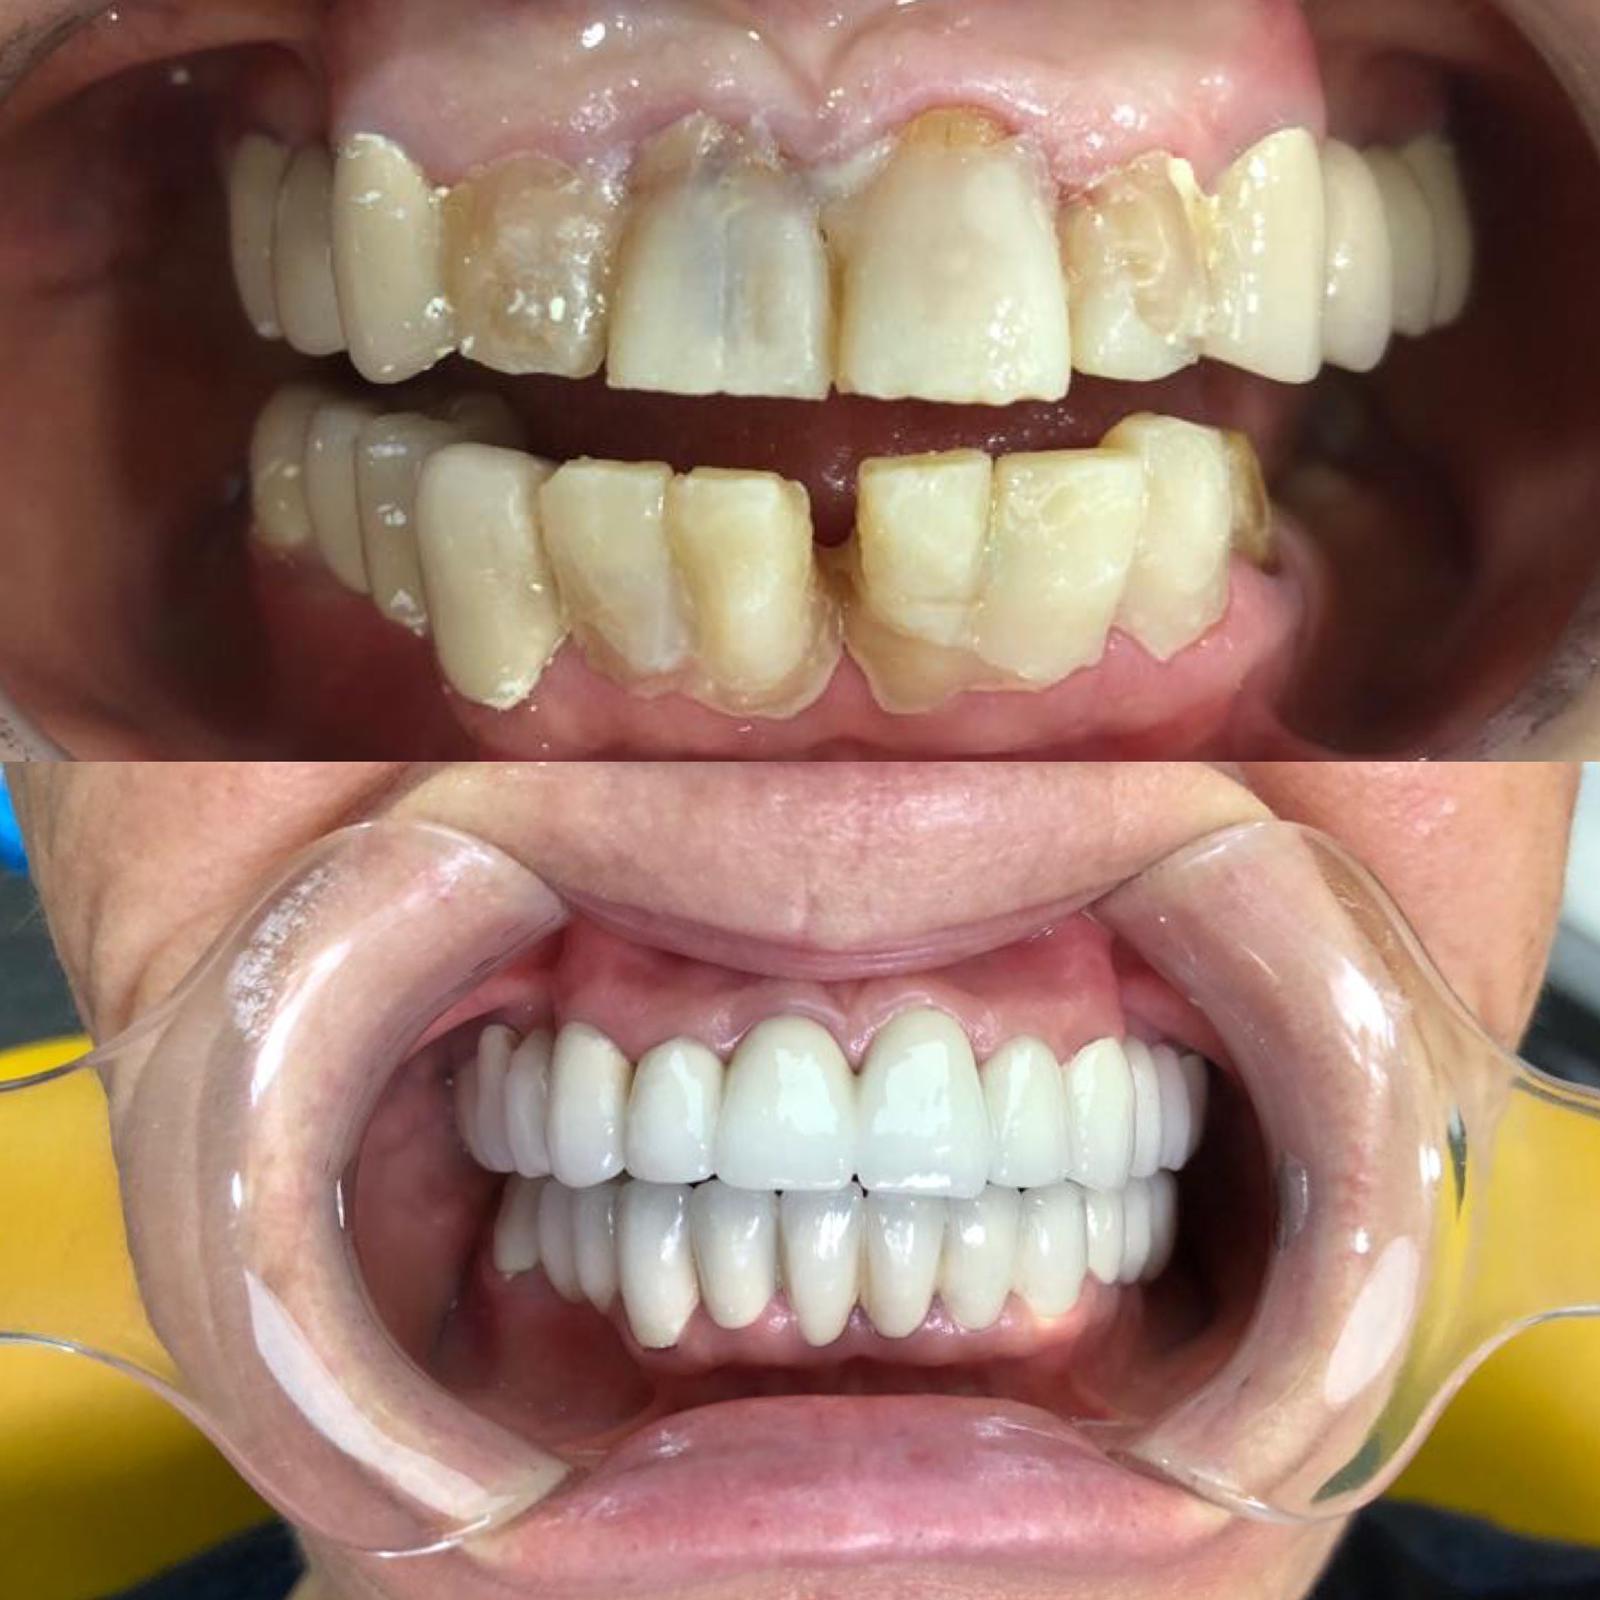 sultangazi porselen diş